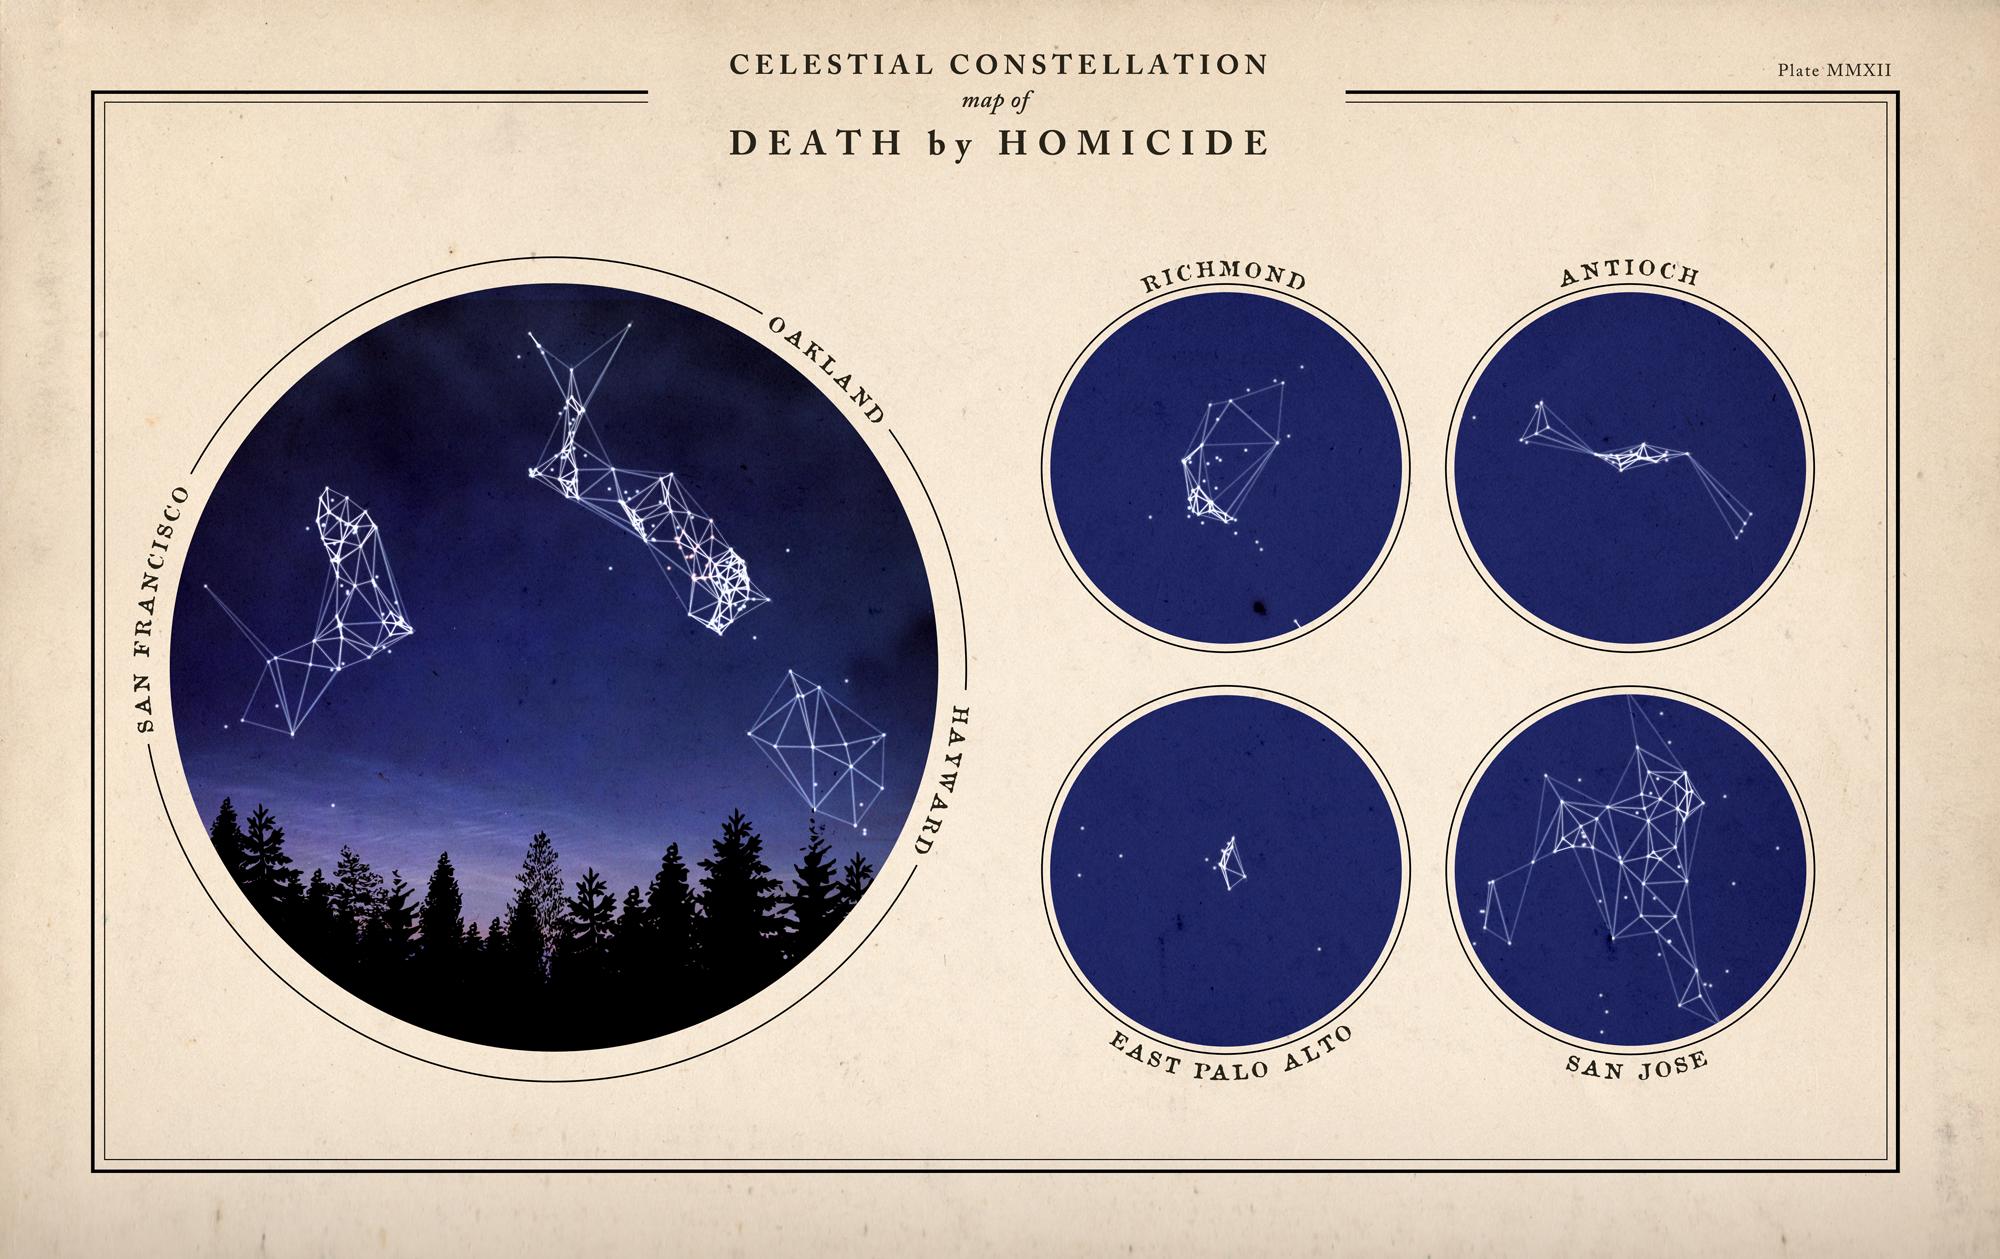 Bay Area Homicide Constellation Map | Doug McCune